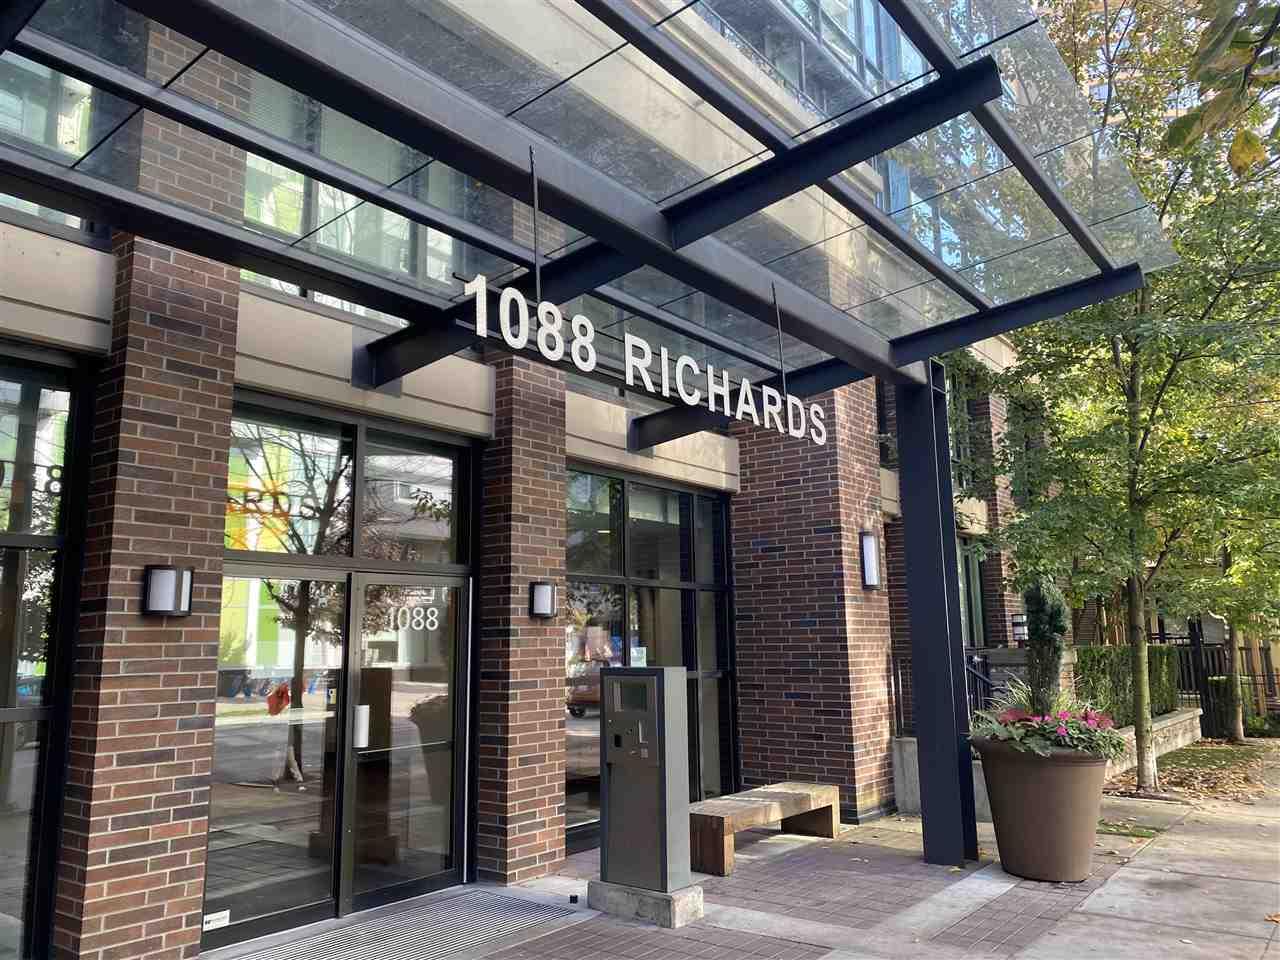 319 1088 RICHARDS STREET - MLS® # R2516194